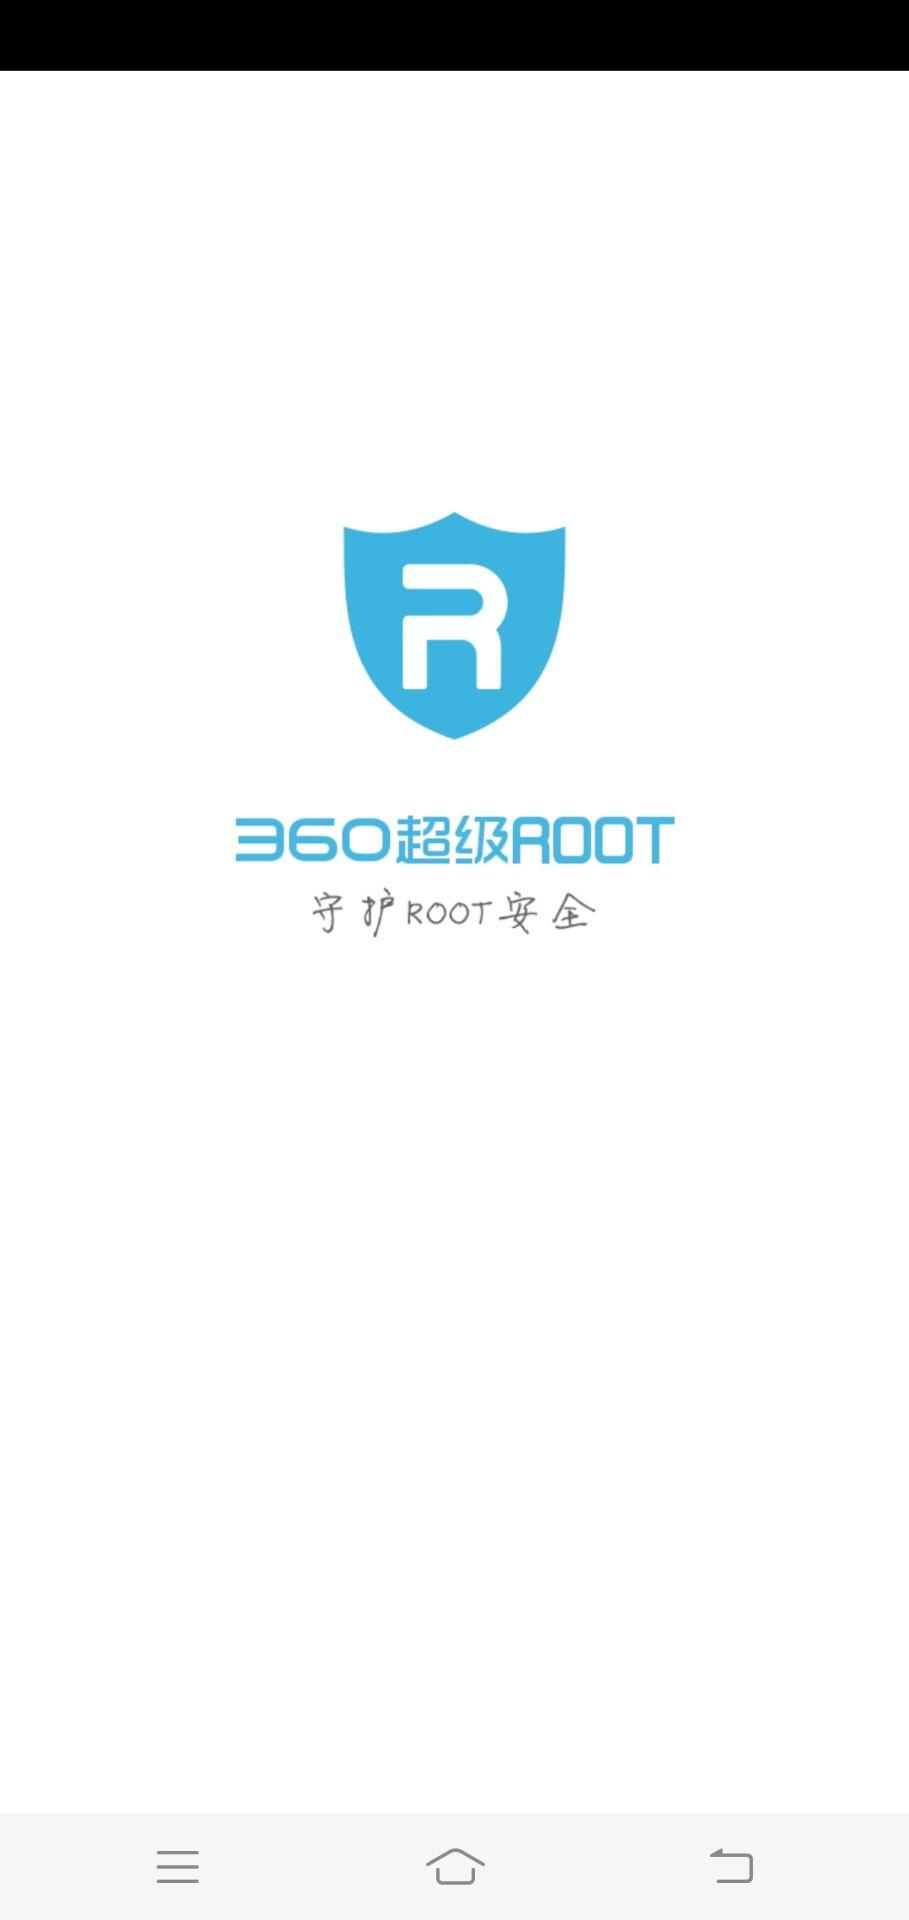 【爱软件更爱分享】360超级root(安全快捷的root)-爱小助